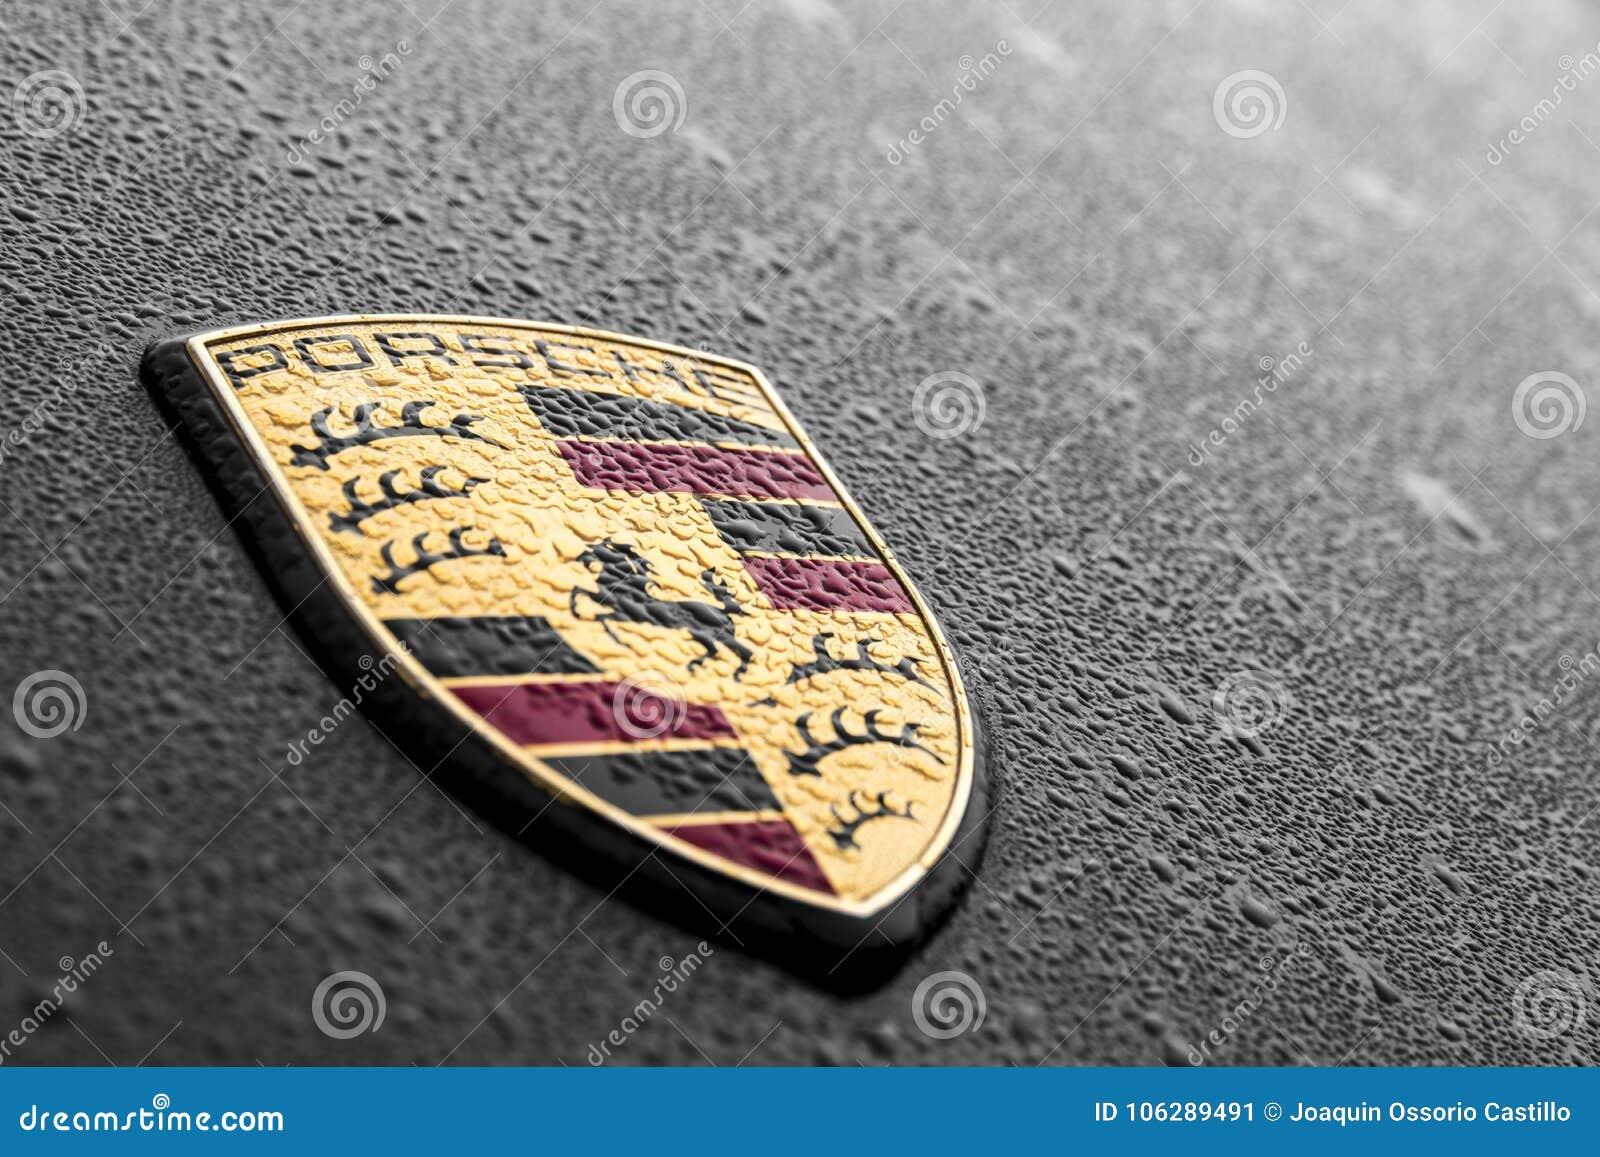 Porsche Logo Editorial Photo Image Of Automotive Europe 106289491